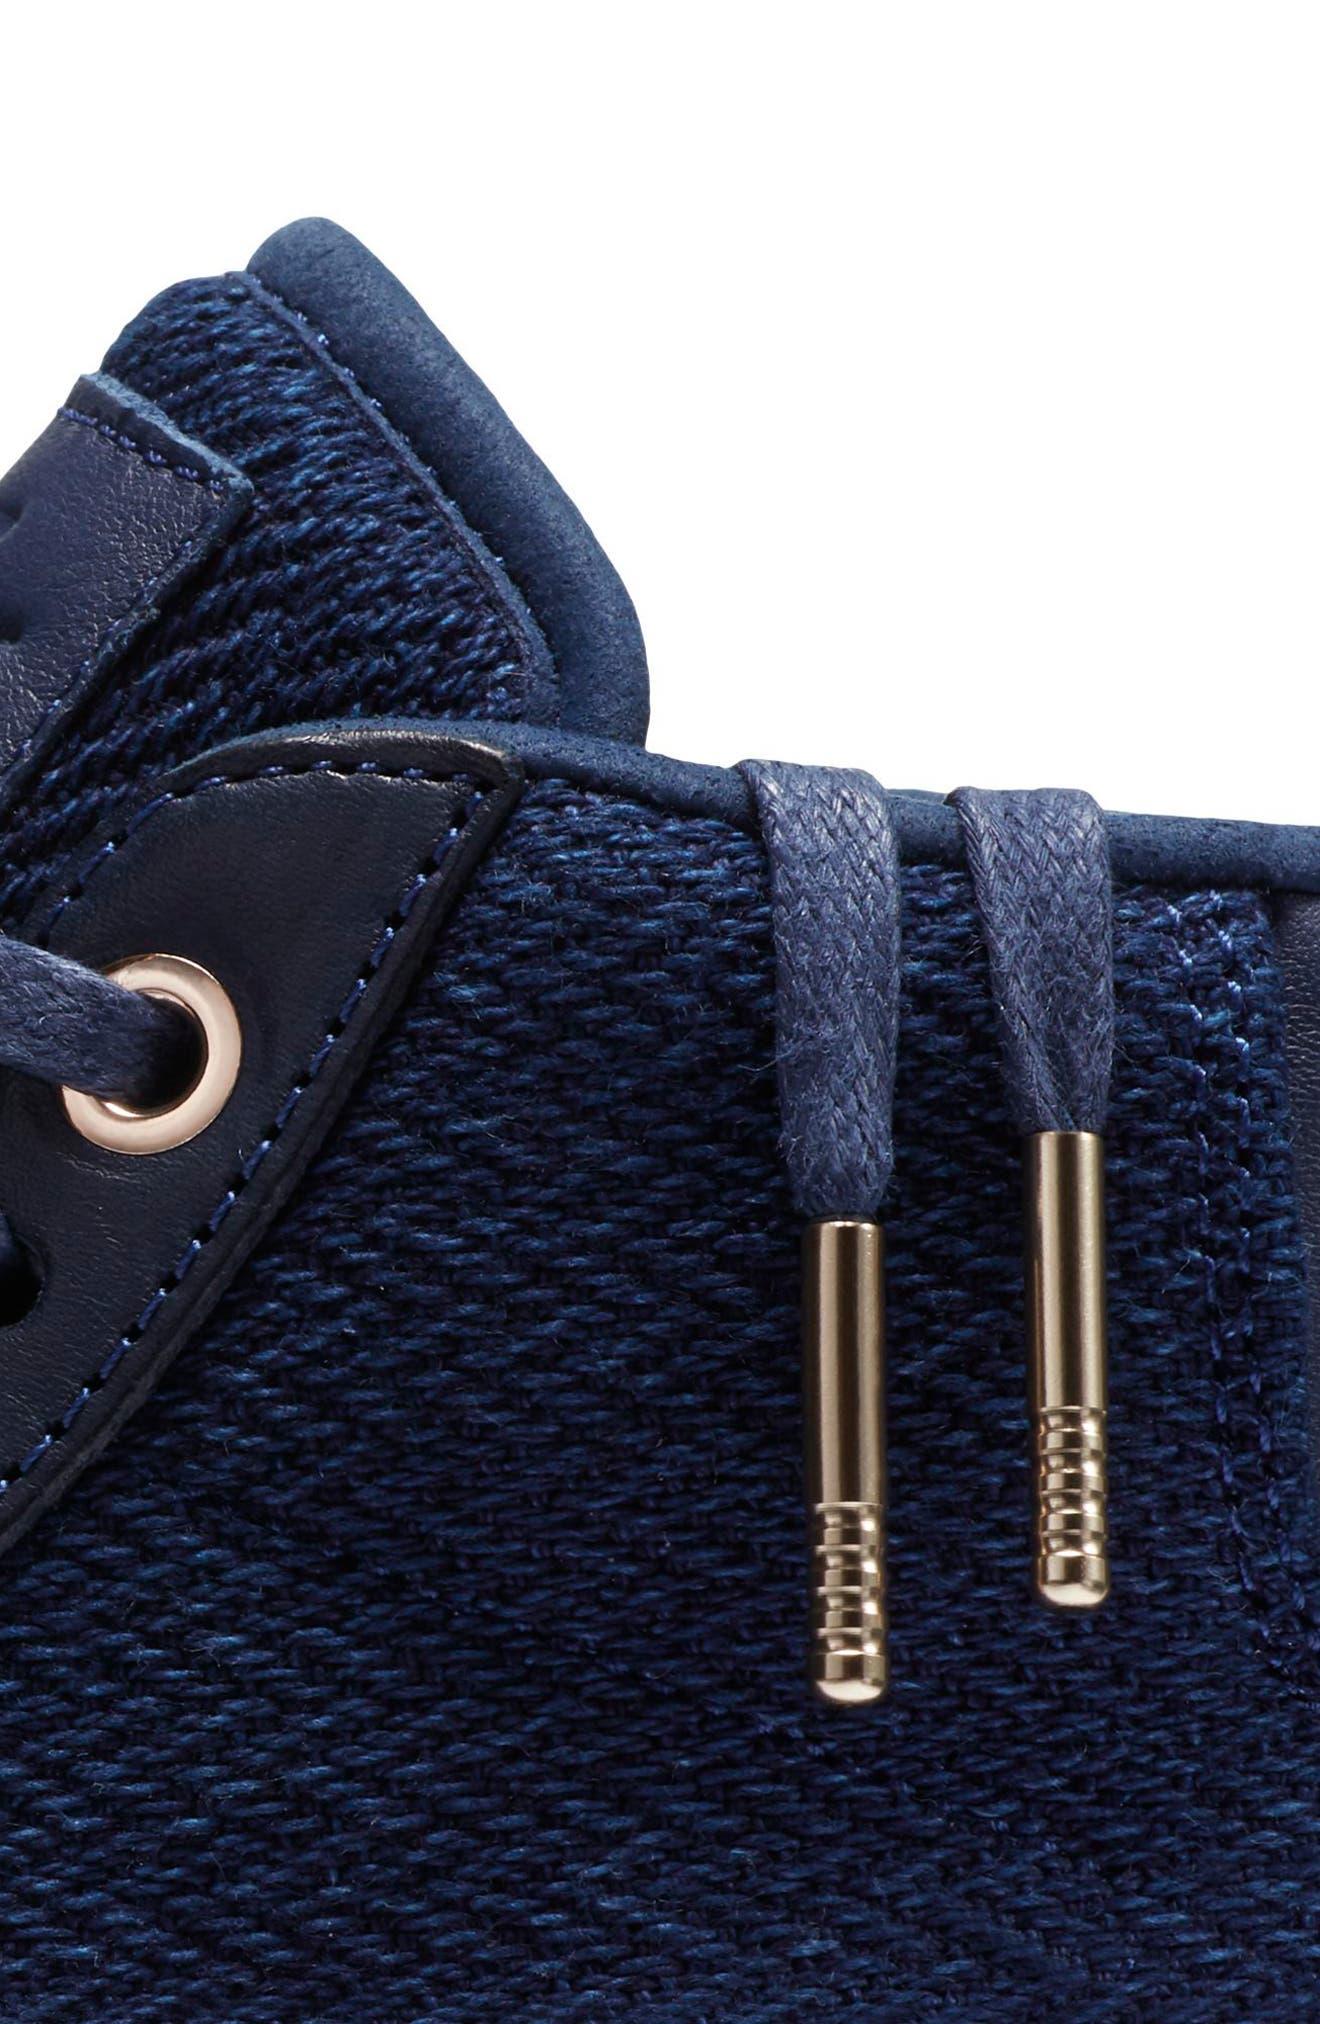 Blazer Mid Premium LX Sneaker,                             Alternate thumbnail 6, color,                             400